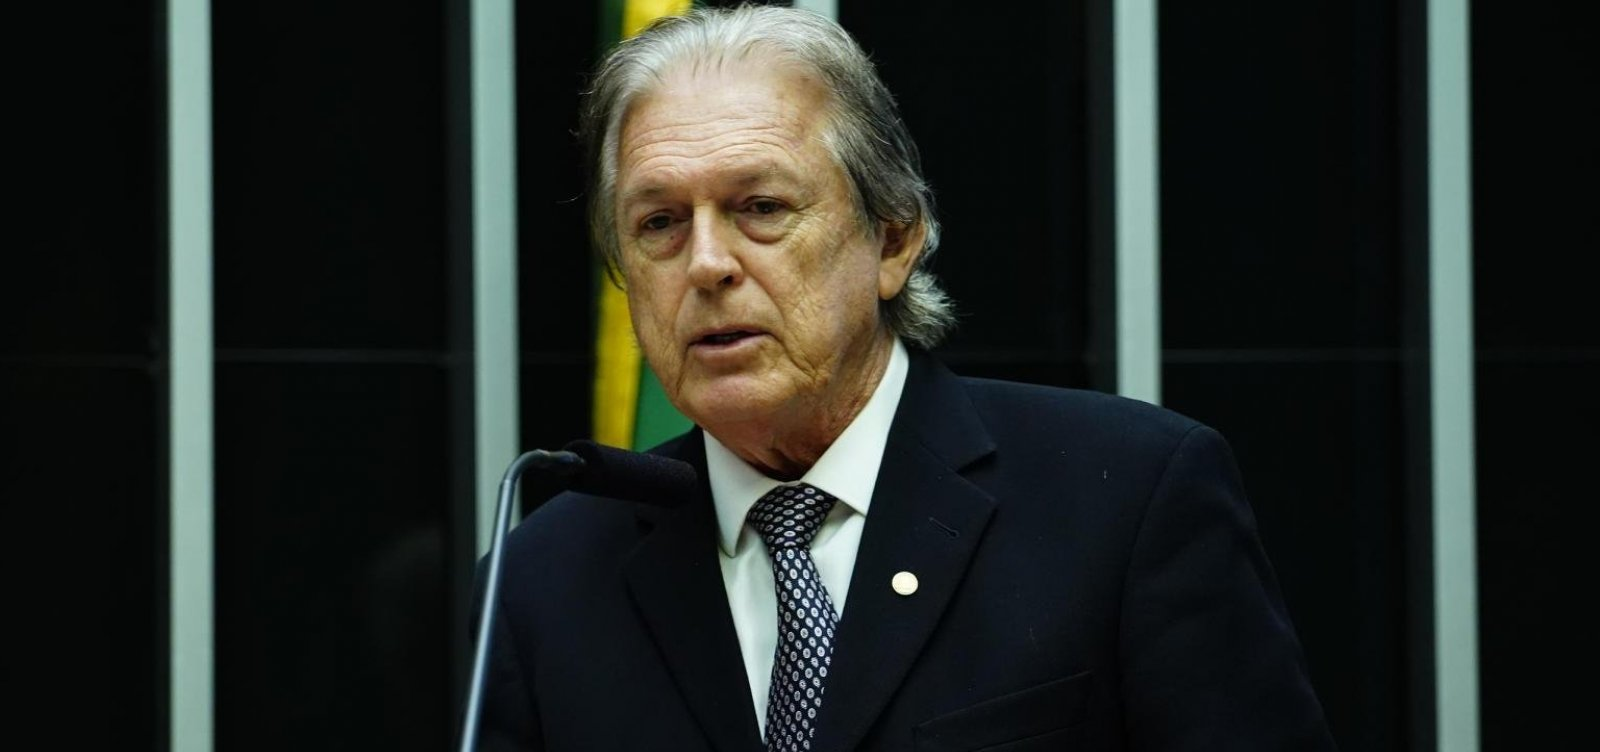 Presidente do PSL chama manifestações pró-Bolsonaro de 'sem sentido'